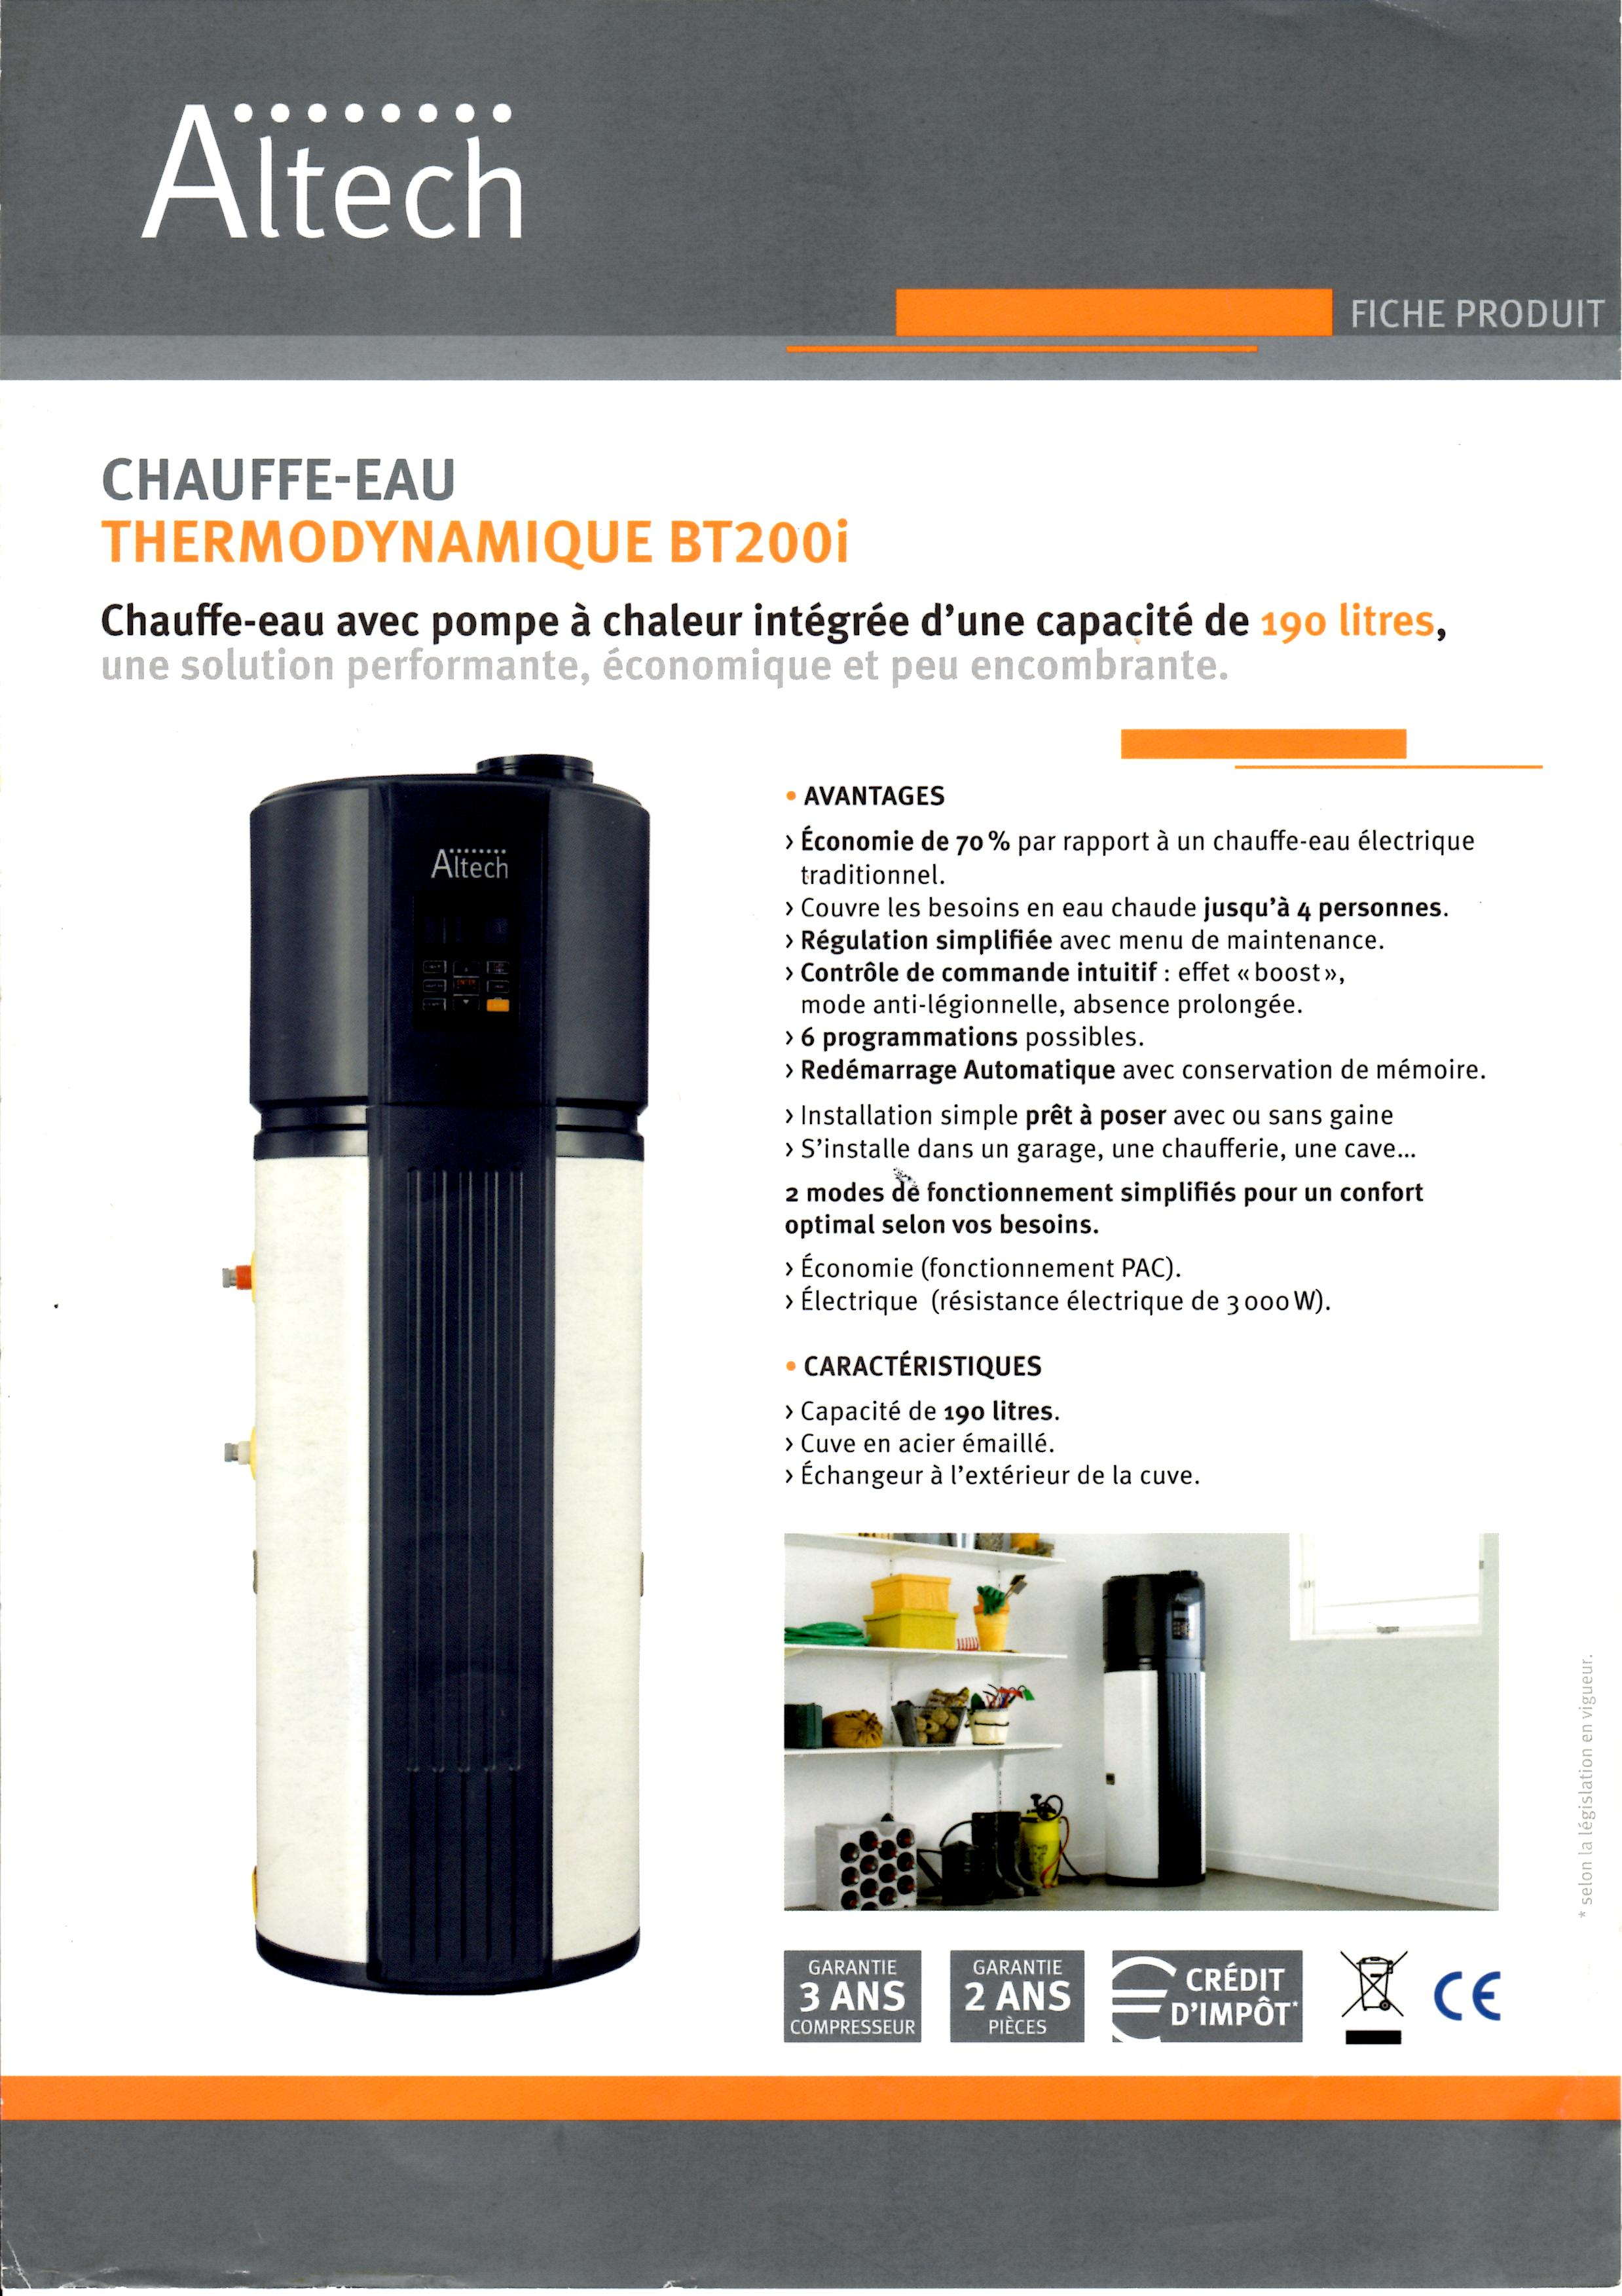 Chauffe-eau thermodynamique Altech BT180